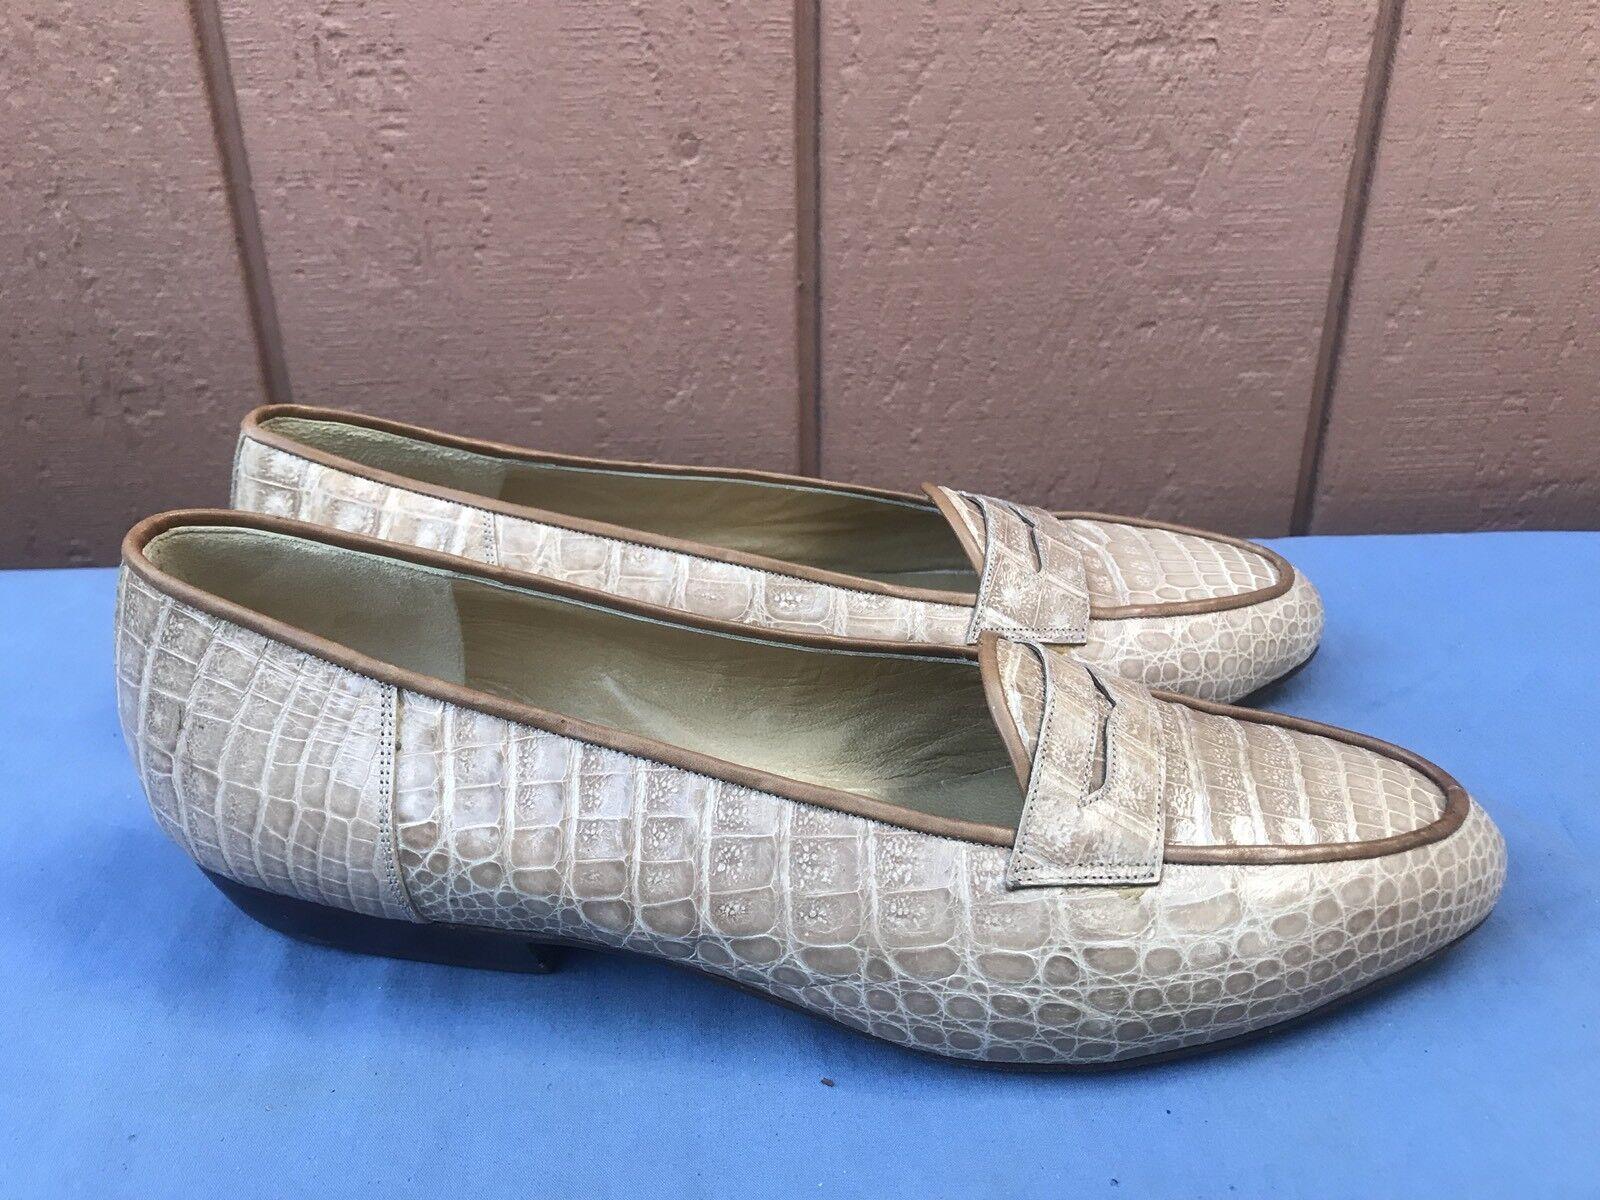 NEW Ugo Rossetti Rossetti Rossetti Women's US 9 Beige Brown Leather Alligator Print Flat Loafer A7 1d4f06